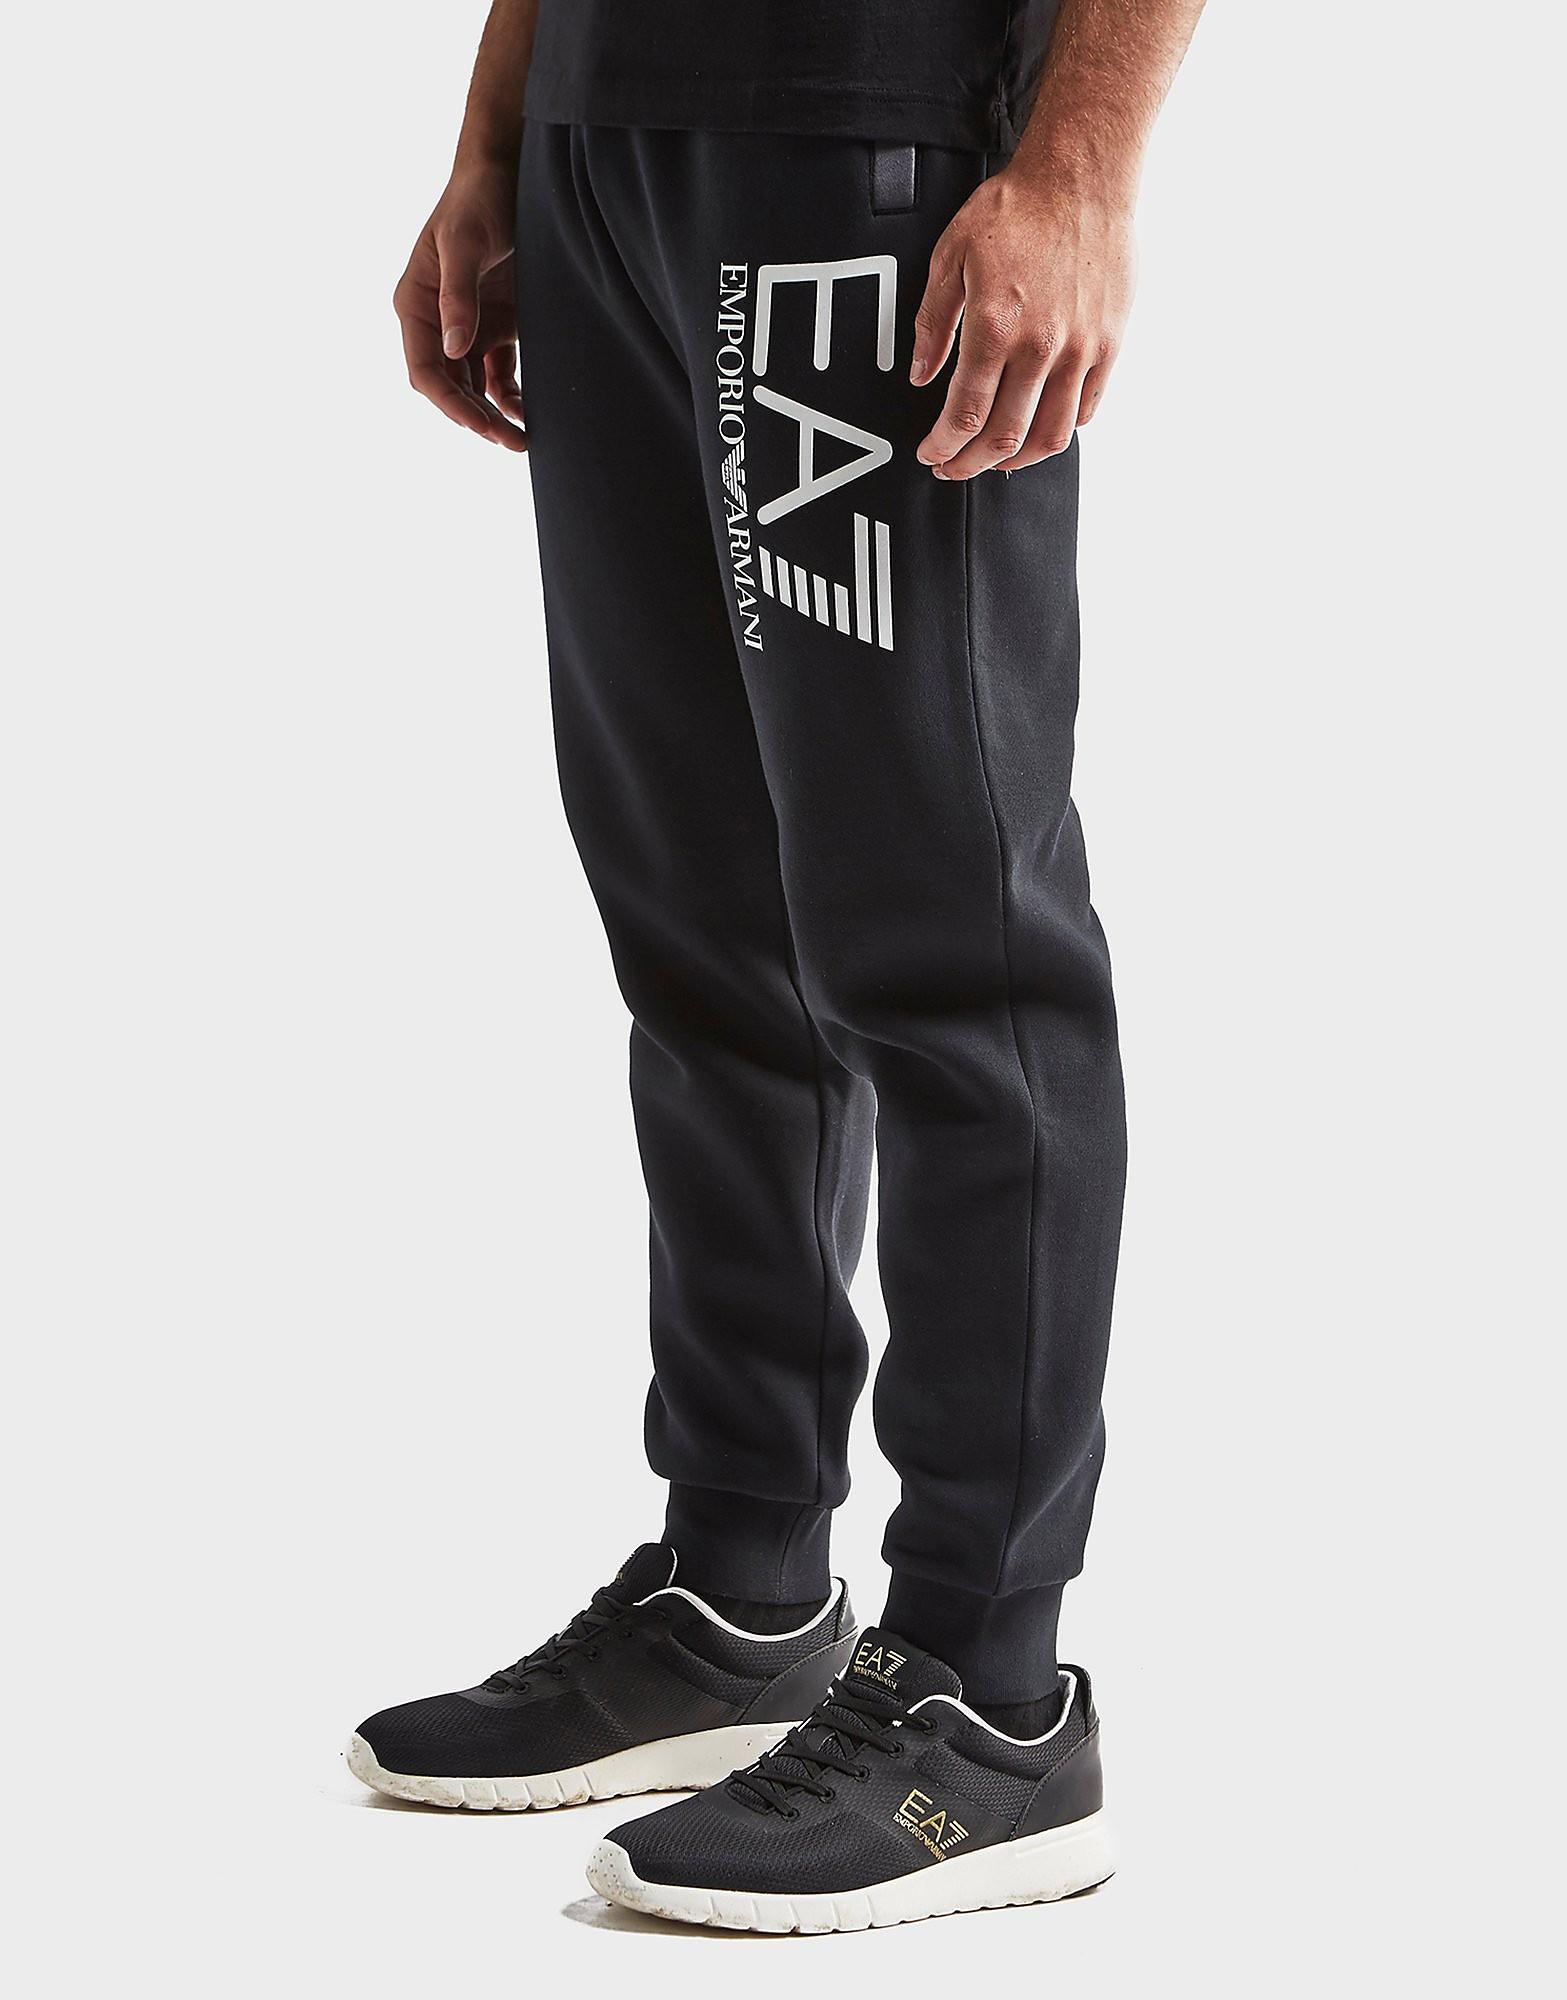 Emporio Armani EA7 Cuffed Track Pants